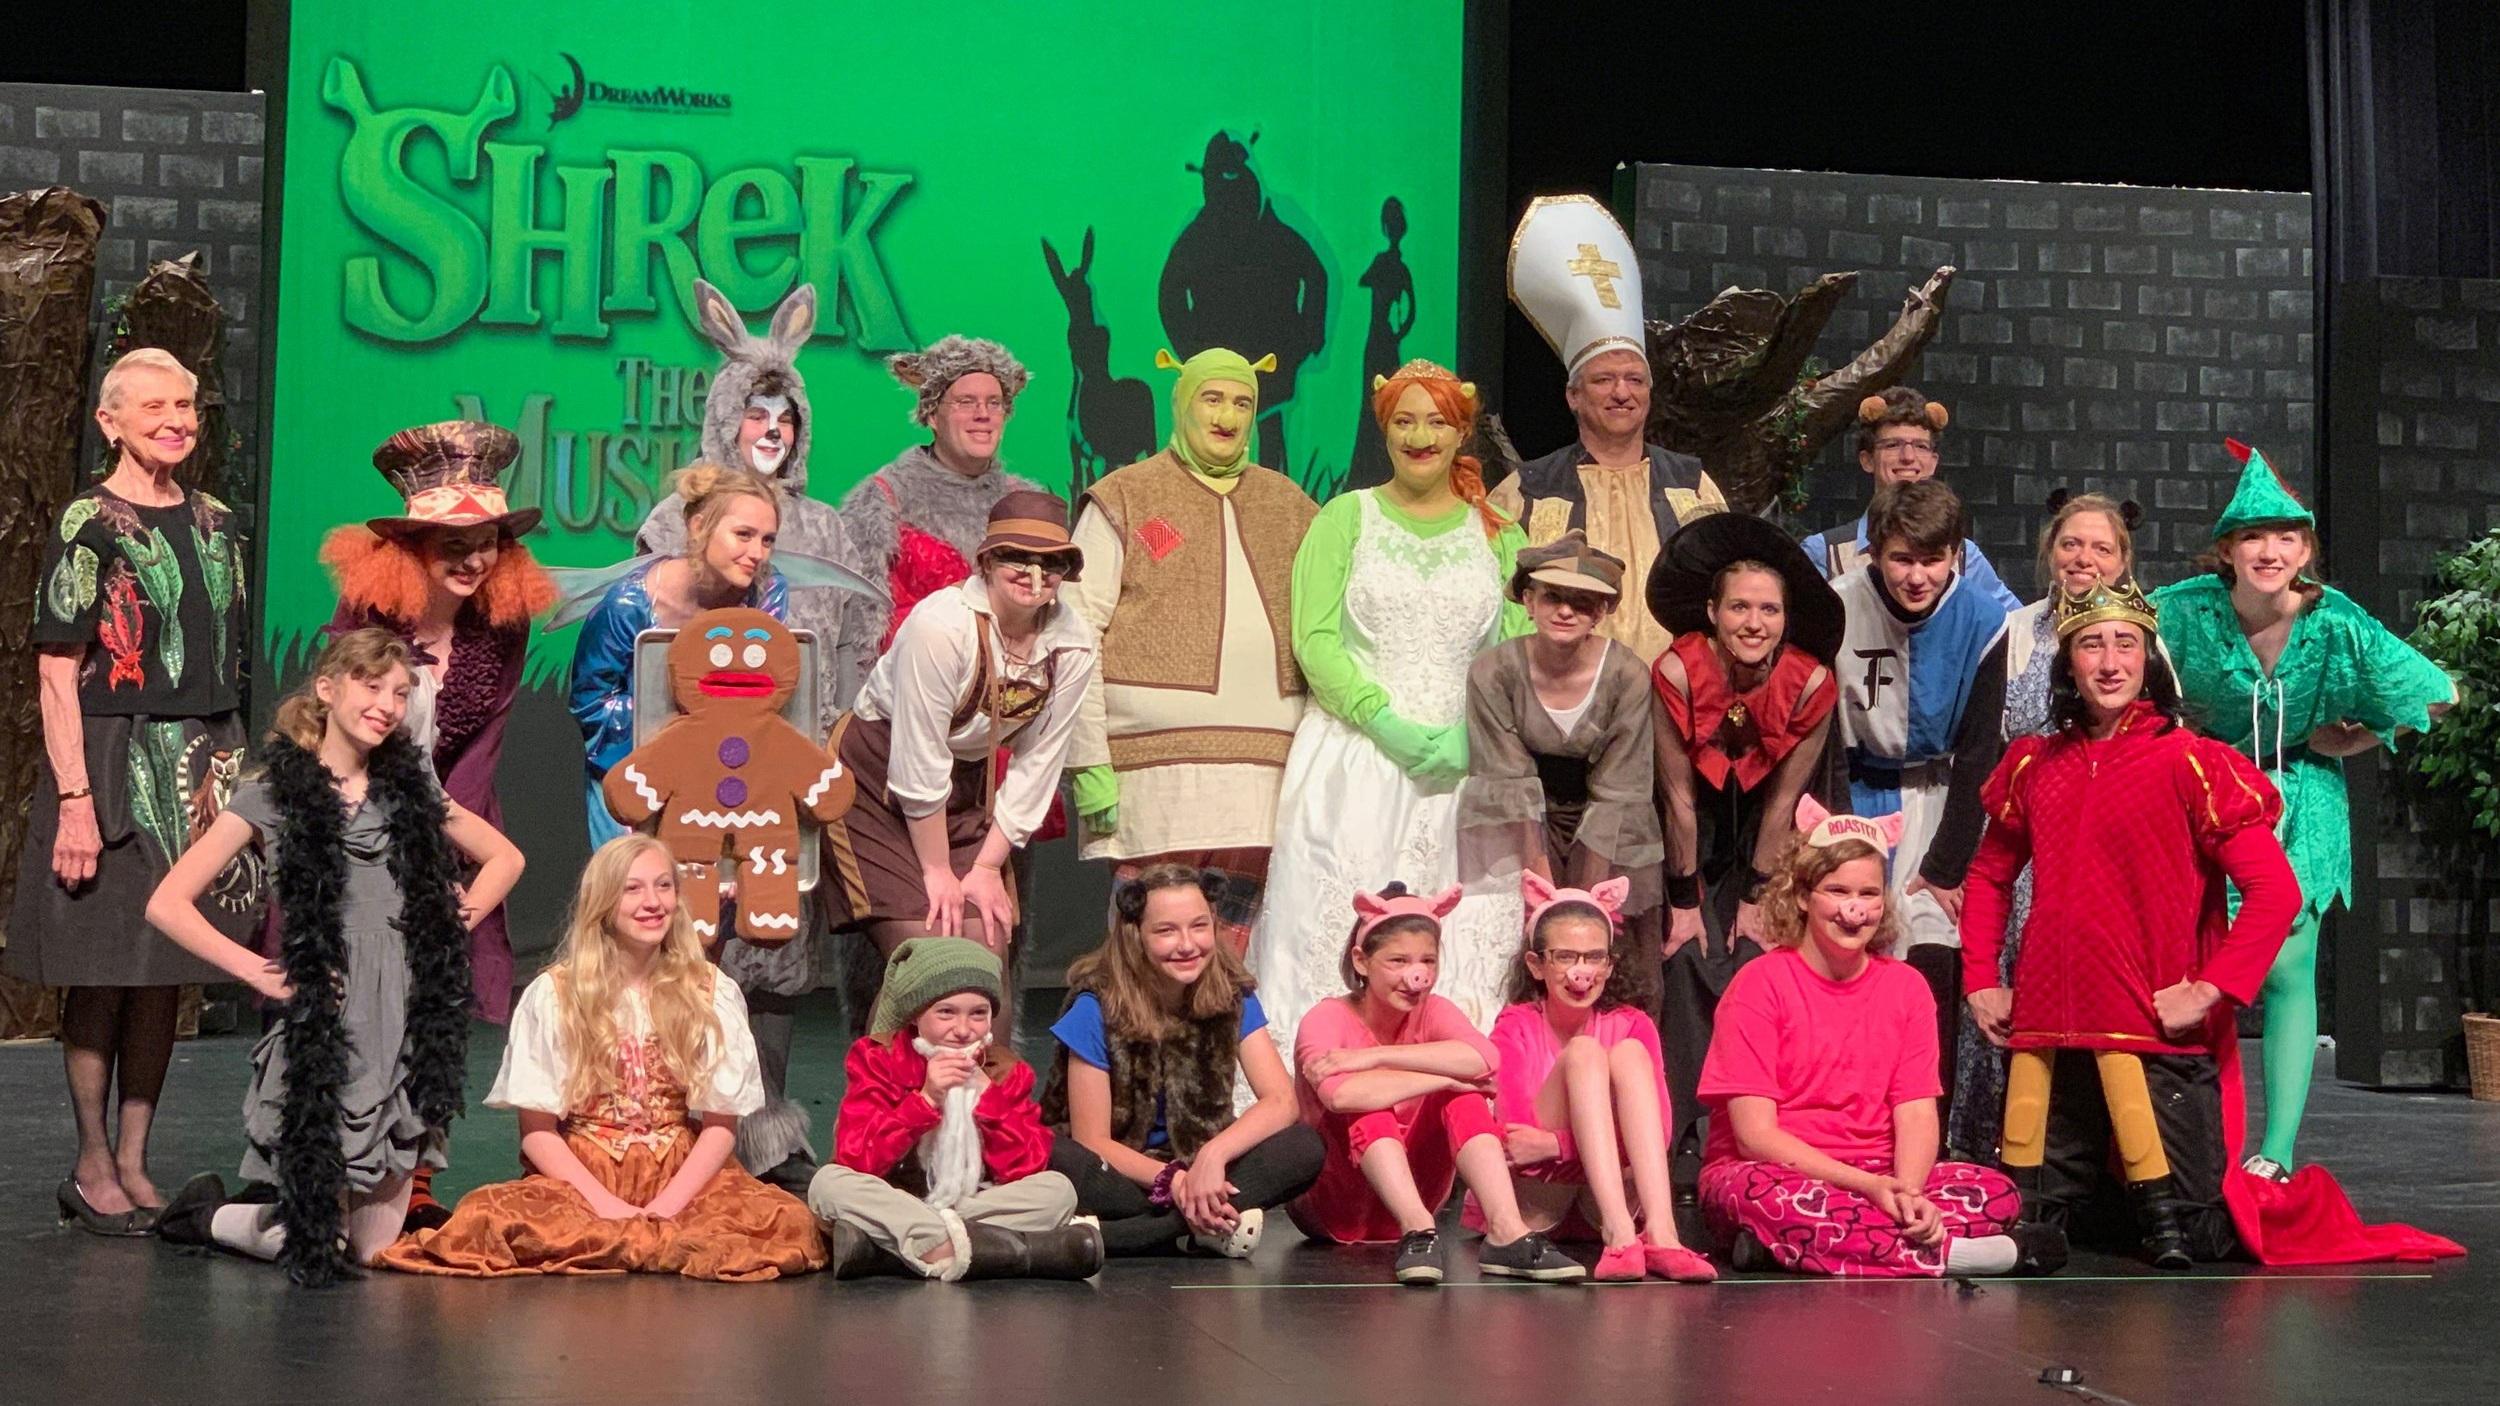 SHREK The Musical June 7 - June 16, 2019 Clintonville, WI